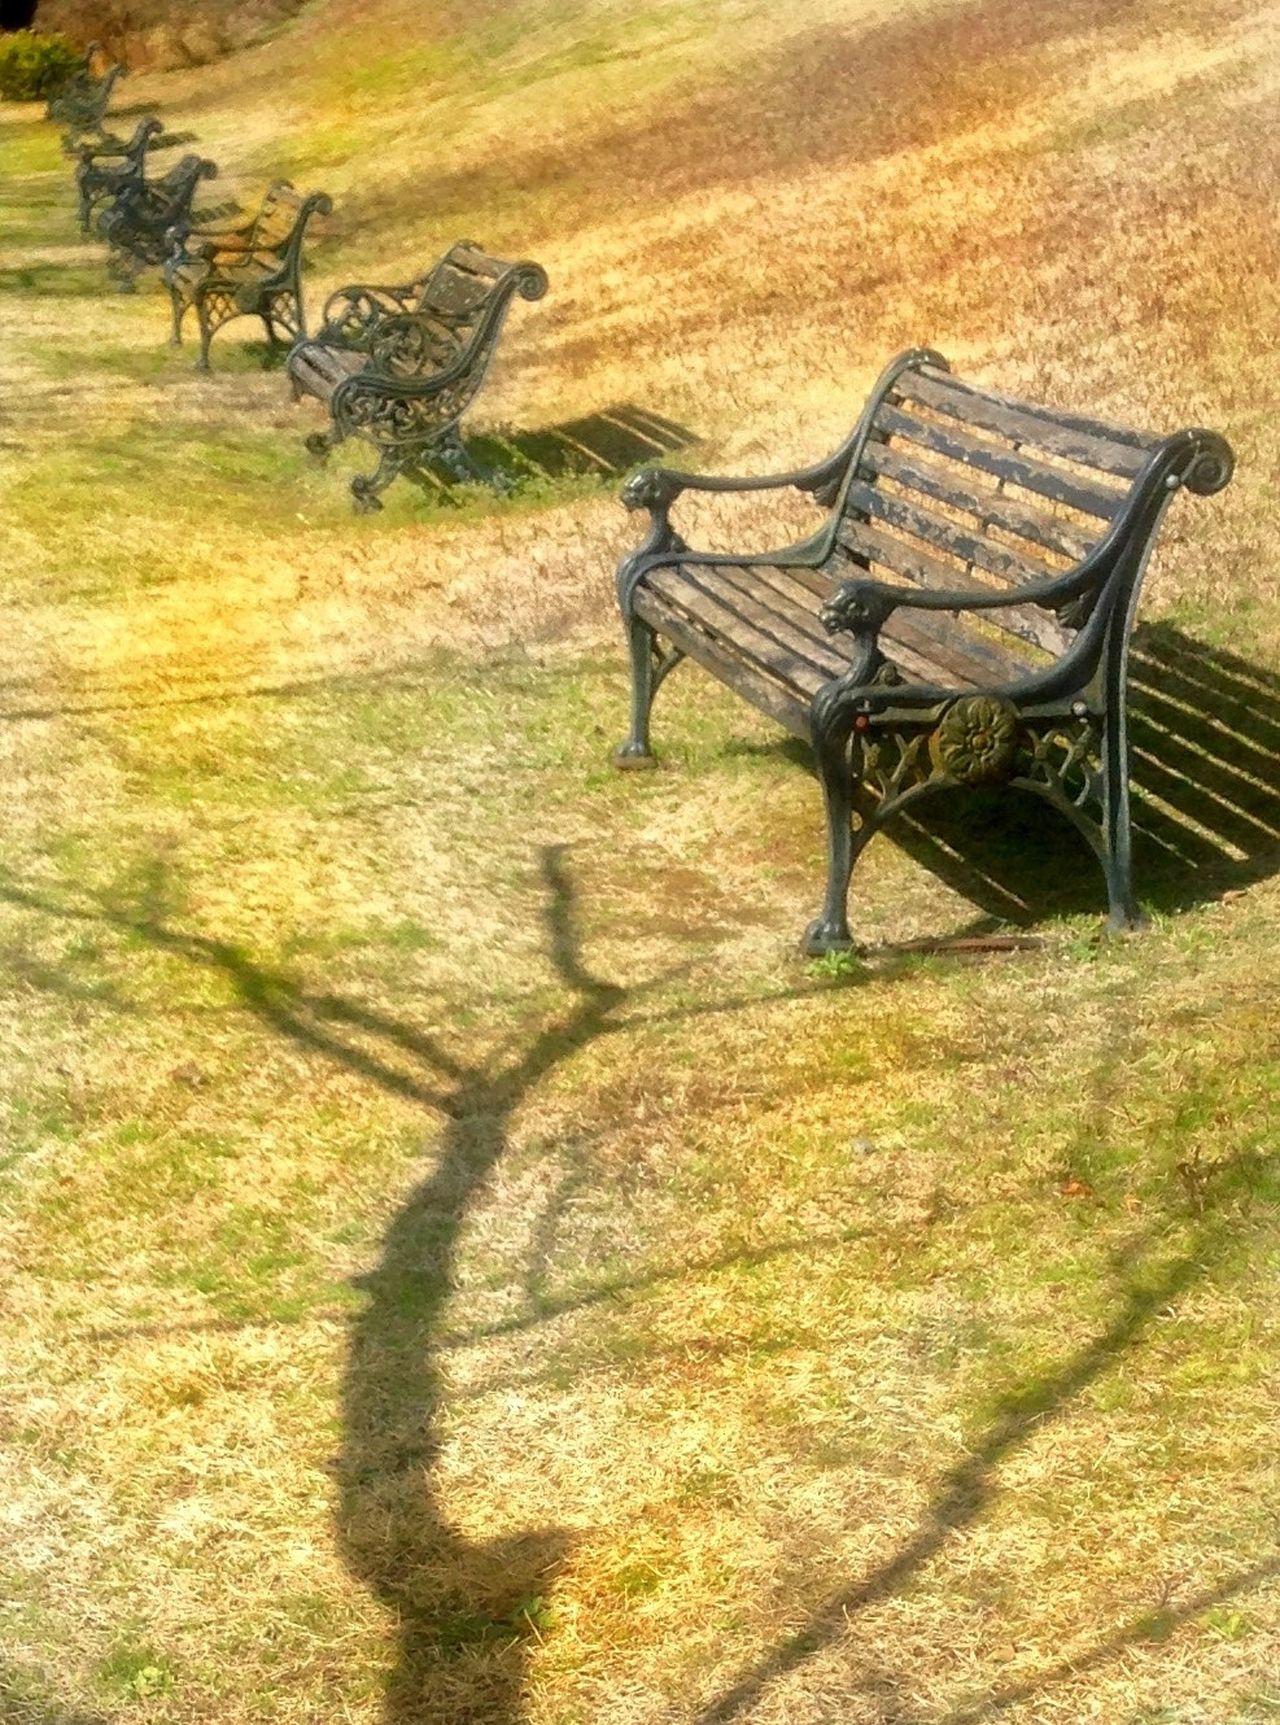 Very Soon 😎 Tree Silhouette Not Visable Shadow Sunlight Grass Outdoors Day Animal Themes Nature No People Togetherness EyeEm Japan EyeEm Best Shots Japan Saikai Japan